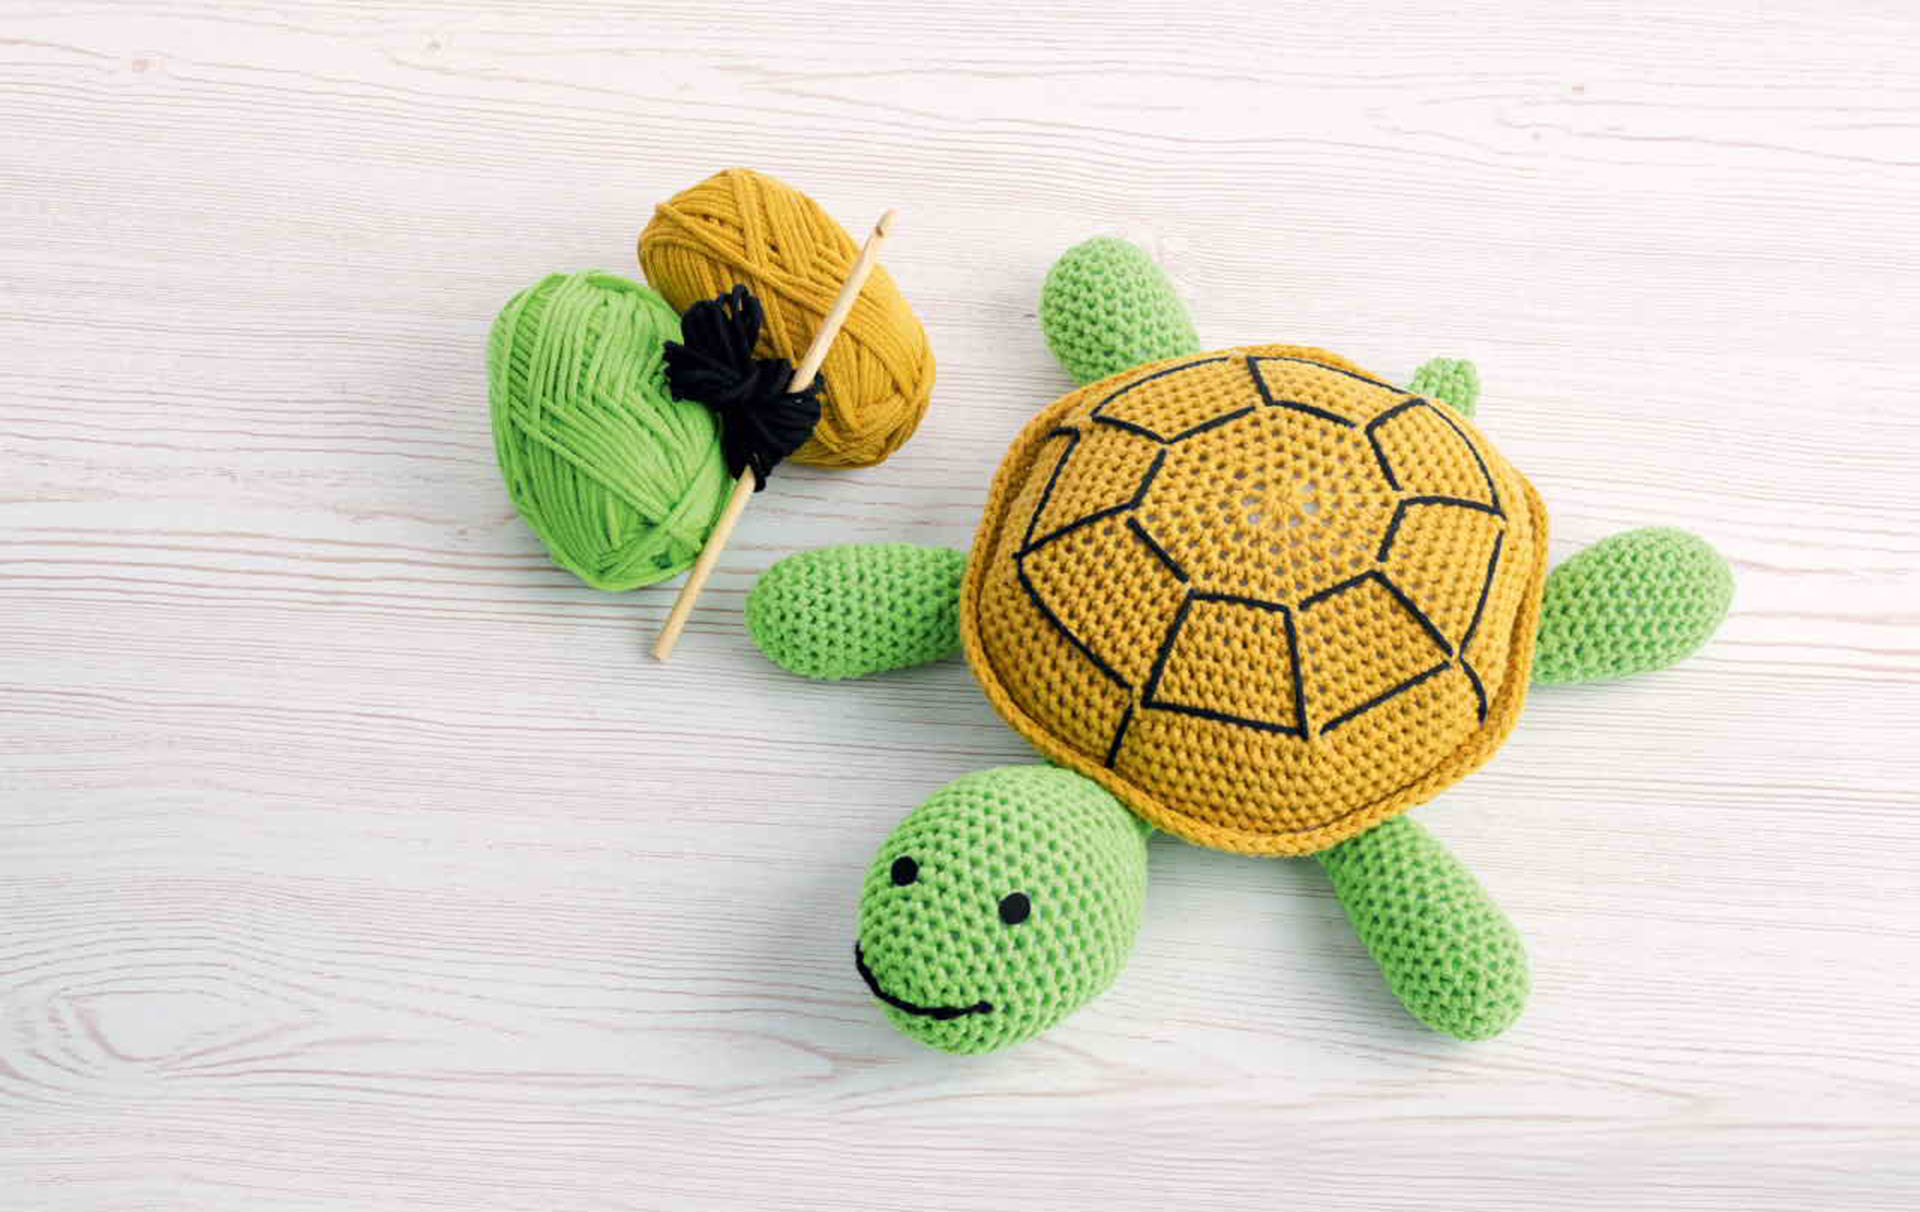 lidl animal crochet kits